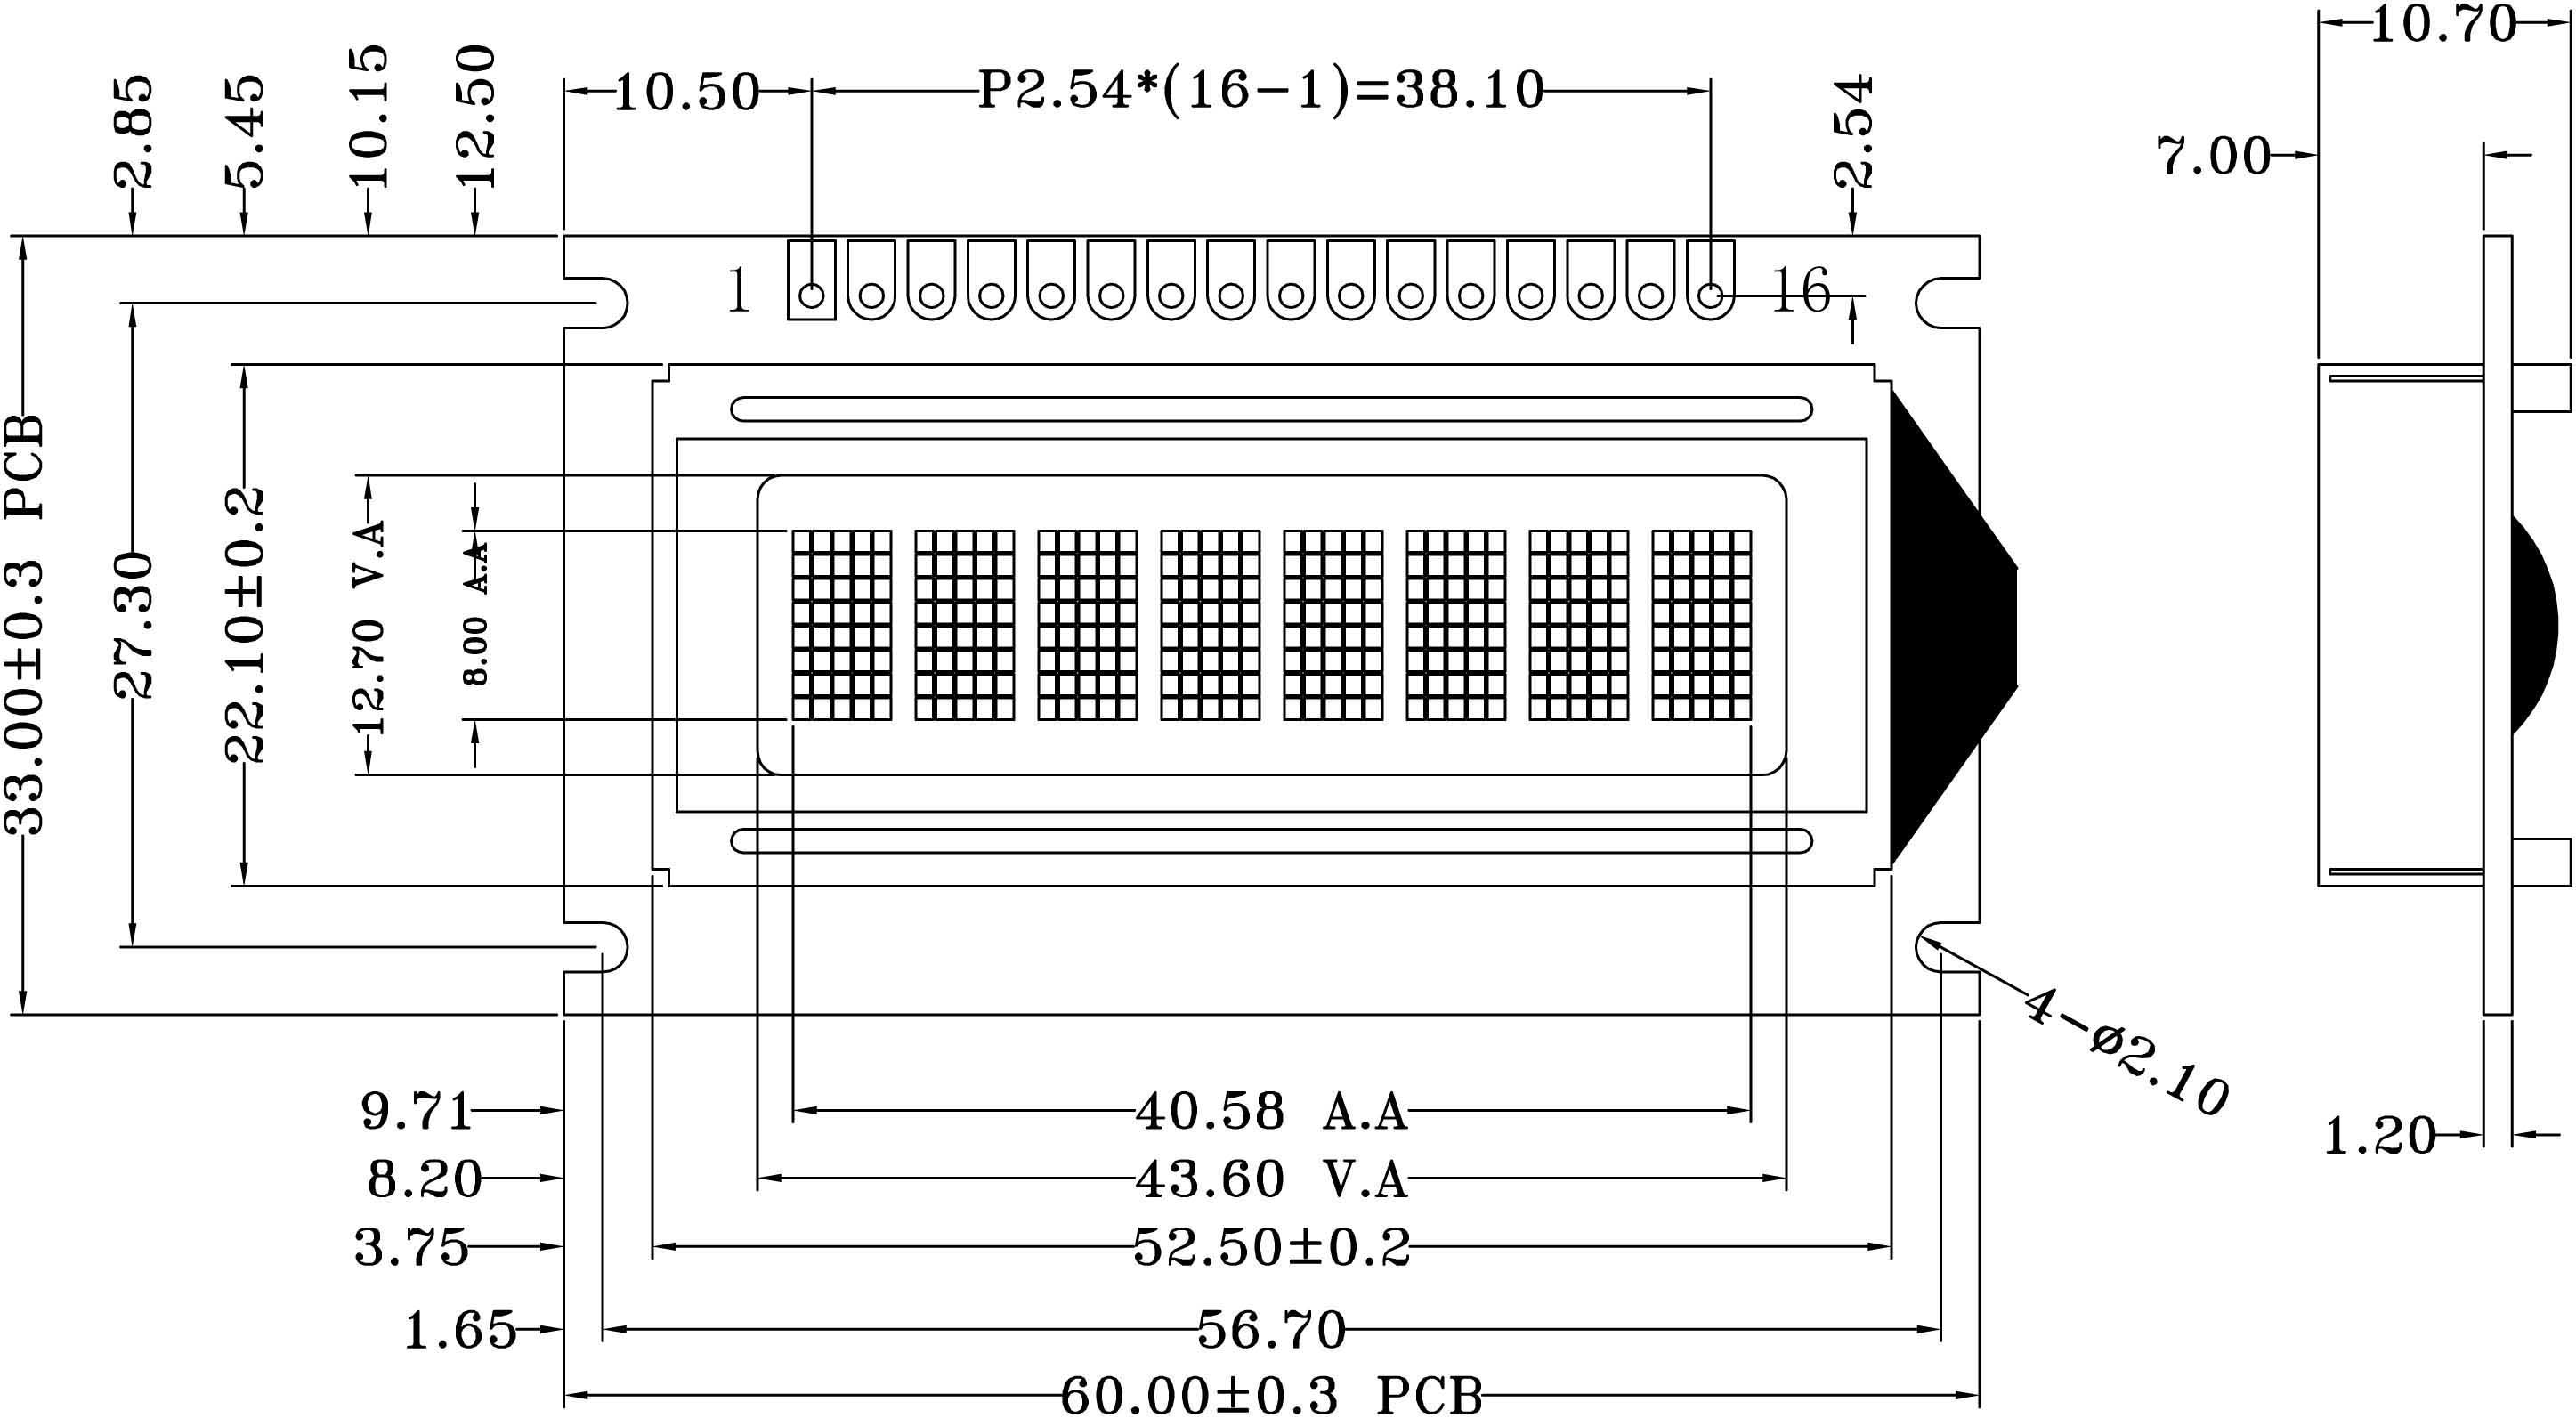 YB0801A资料下载: 字符数:8X1 模组尺寸:60.0x33.0x10.7mm 视域尺寸:43.6x12.7mm LCD模式:STN黄绿 背光类型:LED黄绿 控 制 器:SPLC780 电 压 :3.3V/5.0V 接口方式:6800 serial 8-Bit/4-Bit MPU Interface 工作温度:-20~+70C 储存温度:-30~+80C YB0801A 可以显示 1 行,每行 8 个英文、数字、符号,并可选择日文、俄文、以色列文、希腊文等文字(注俄文、以色列文、希腊文需订制)。并